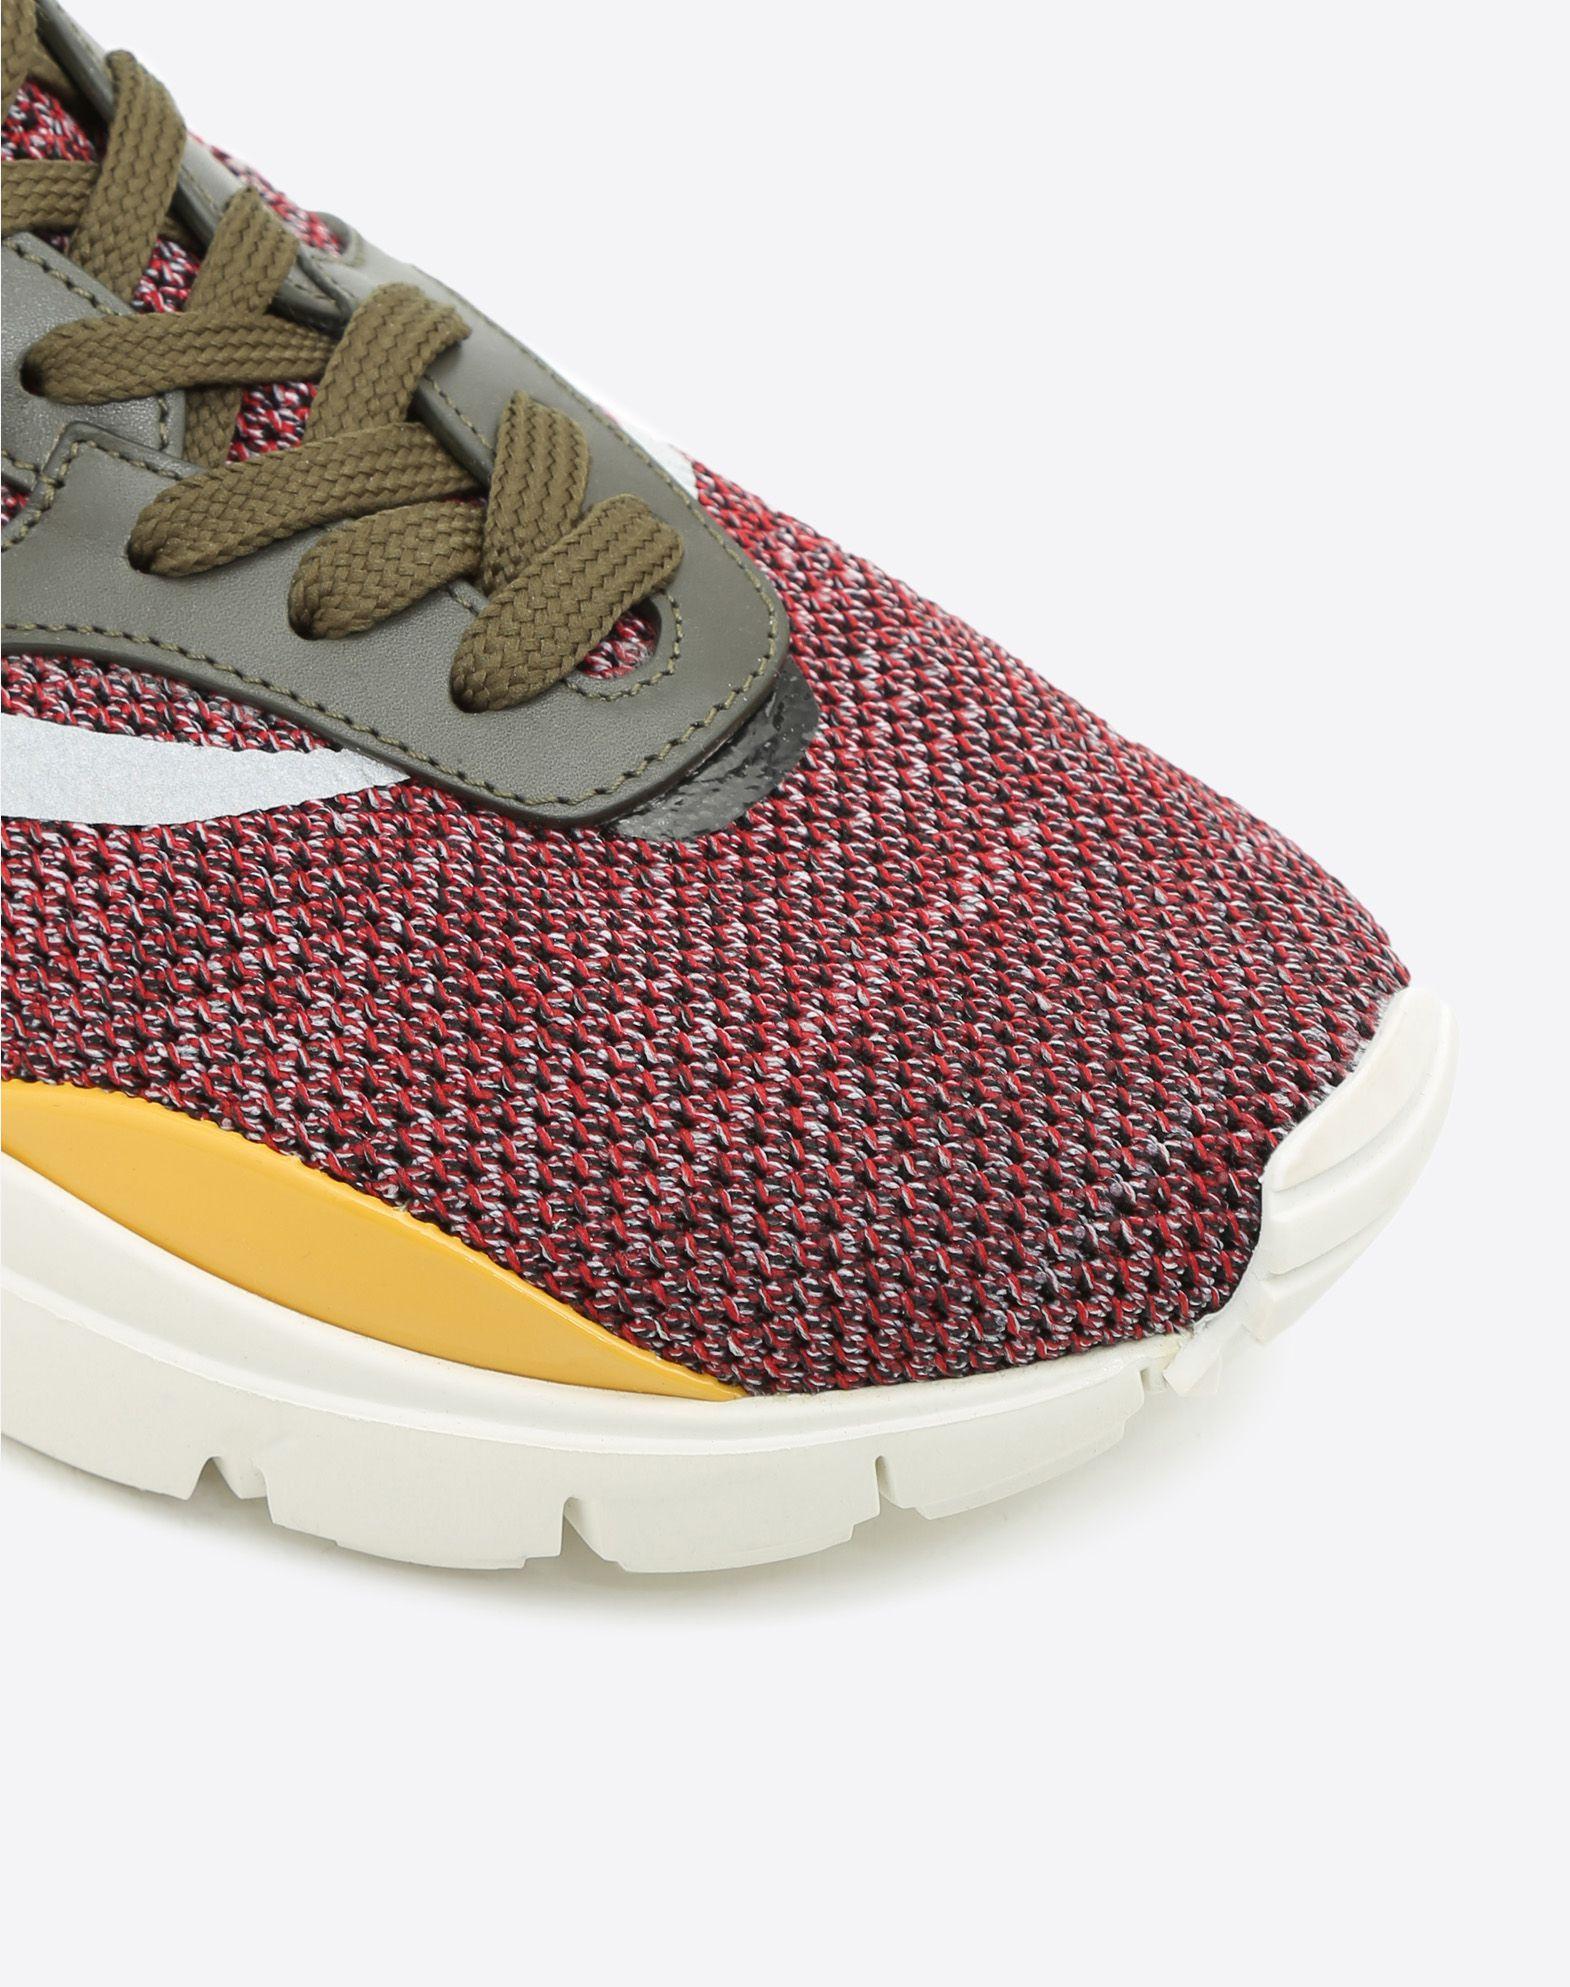 VALENTINO GARAVANI UOMO Heroes Tribe 运动鞋 运动鞋 U b